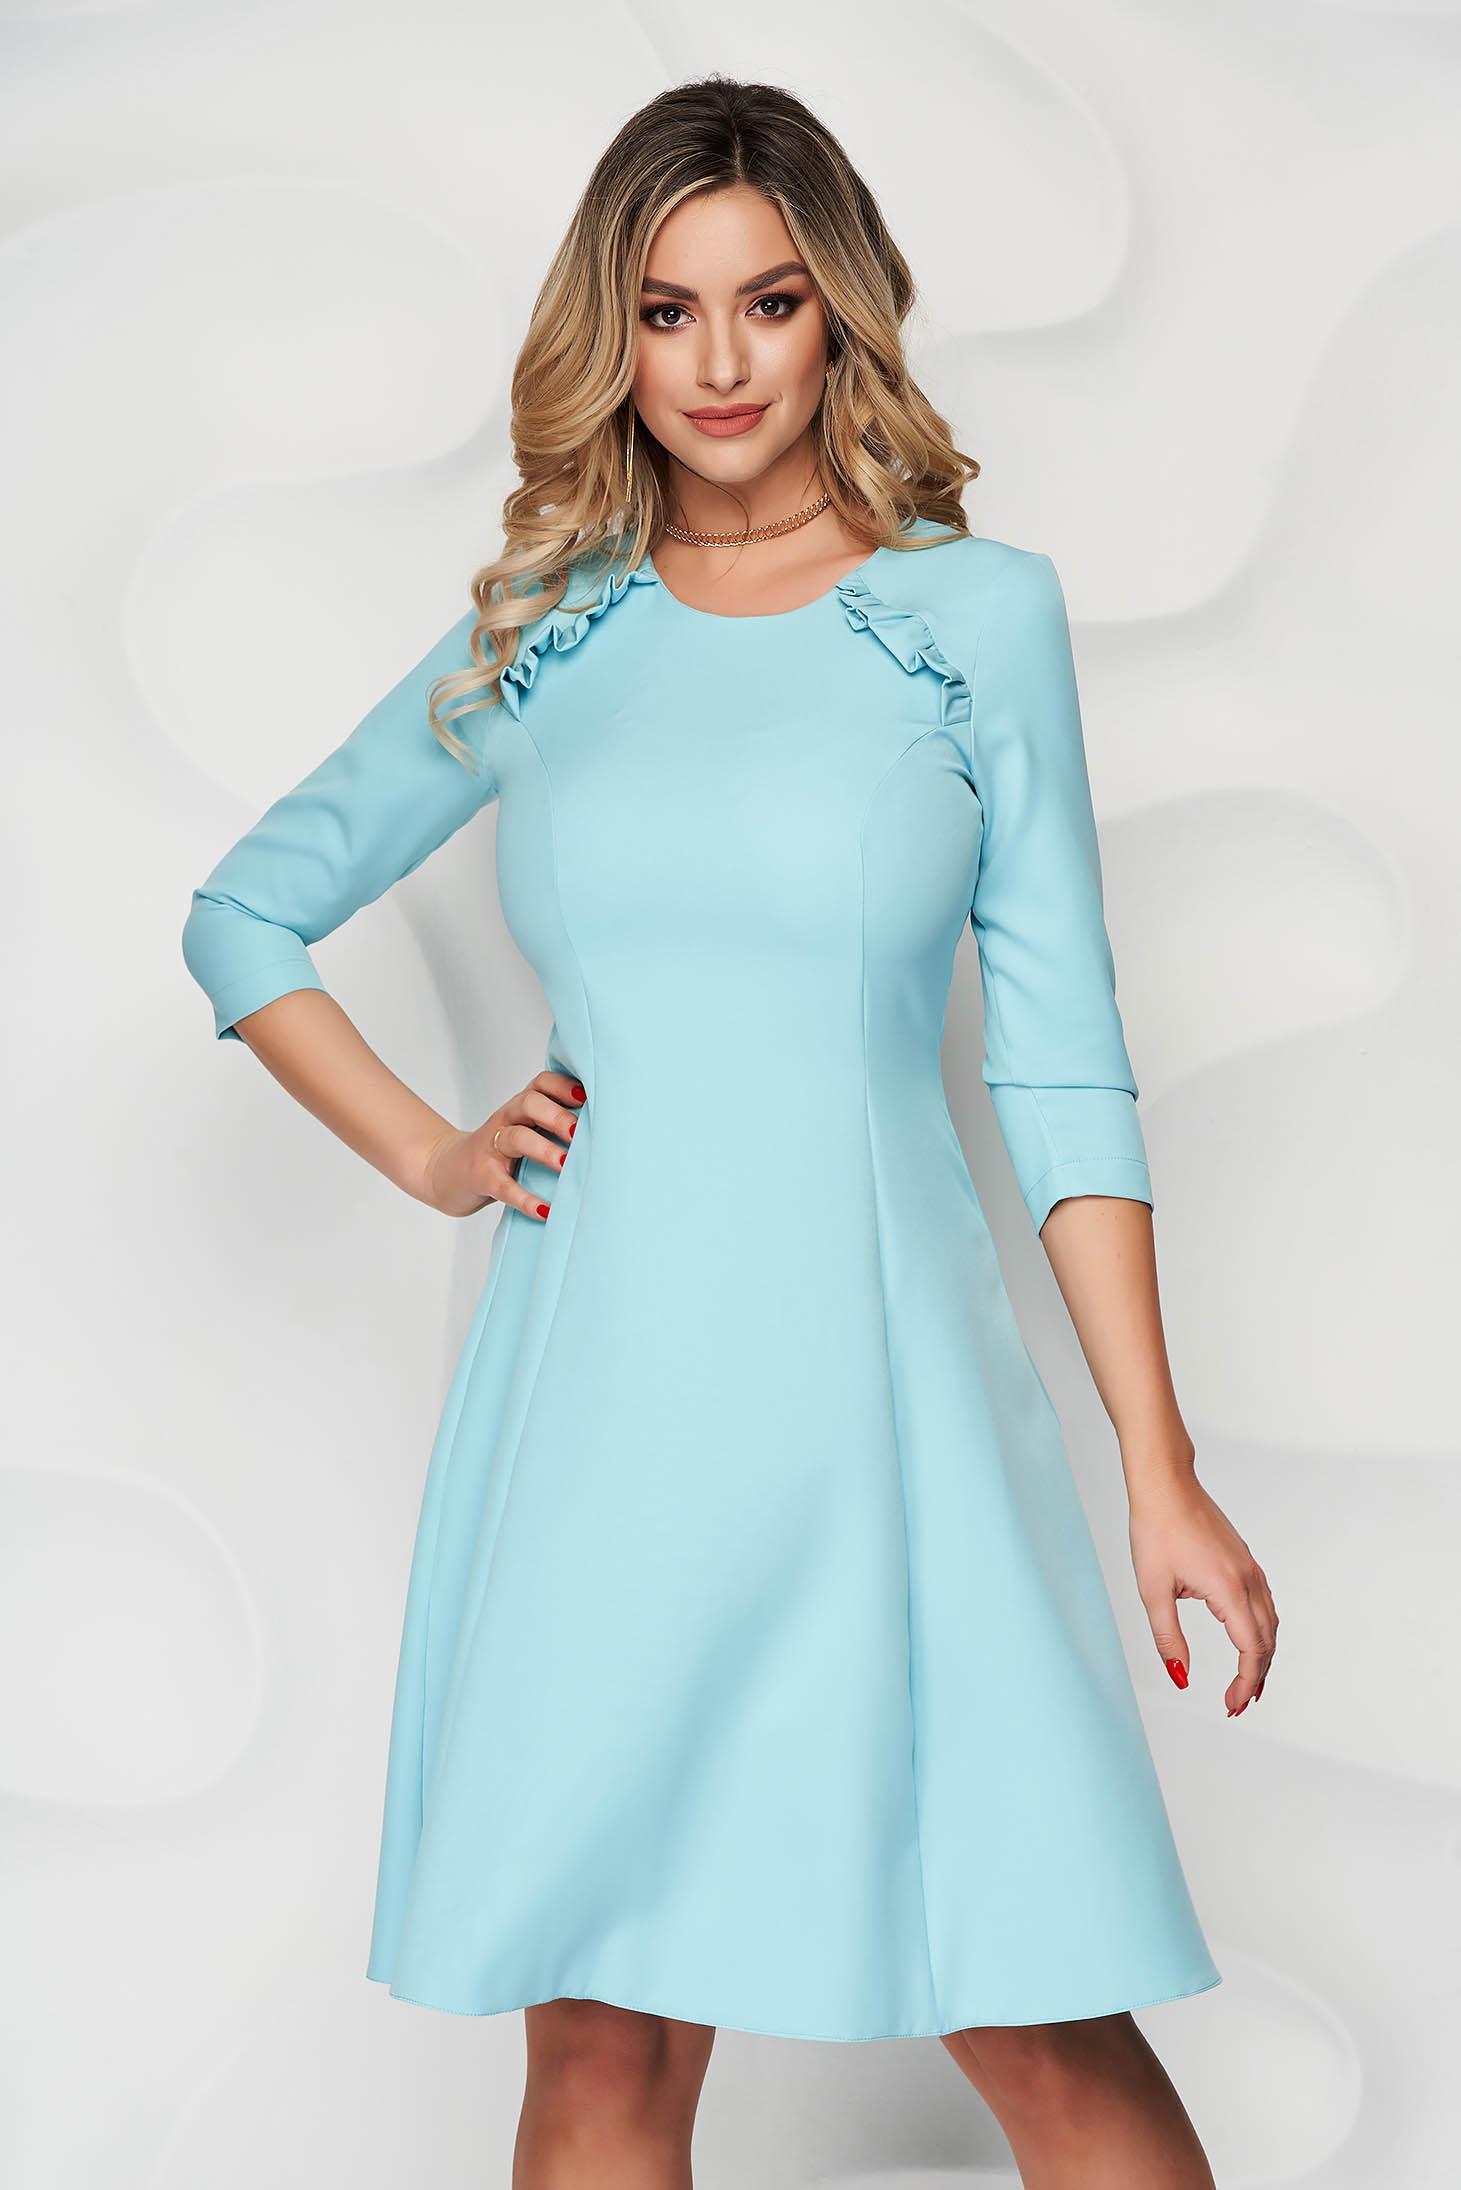 StarShinerS aqua office midi cloche dress slightly elastic fabric with ruffle details